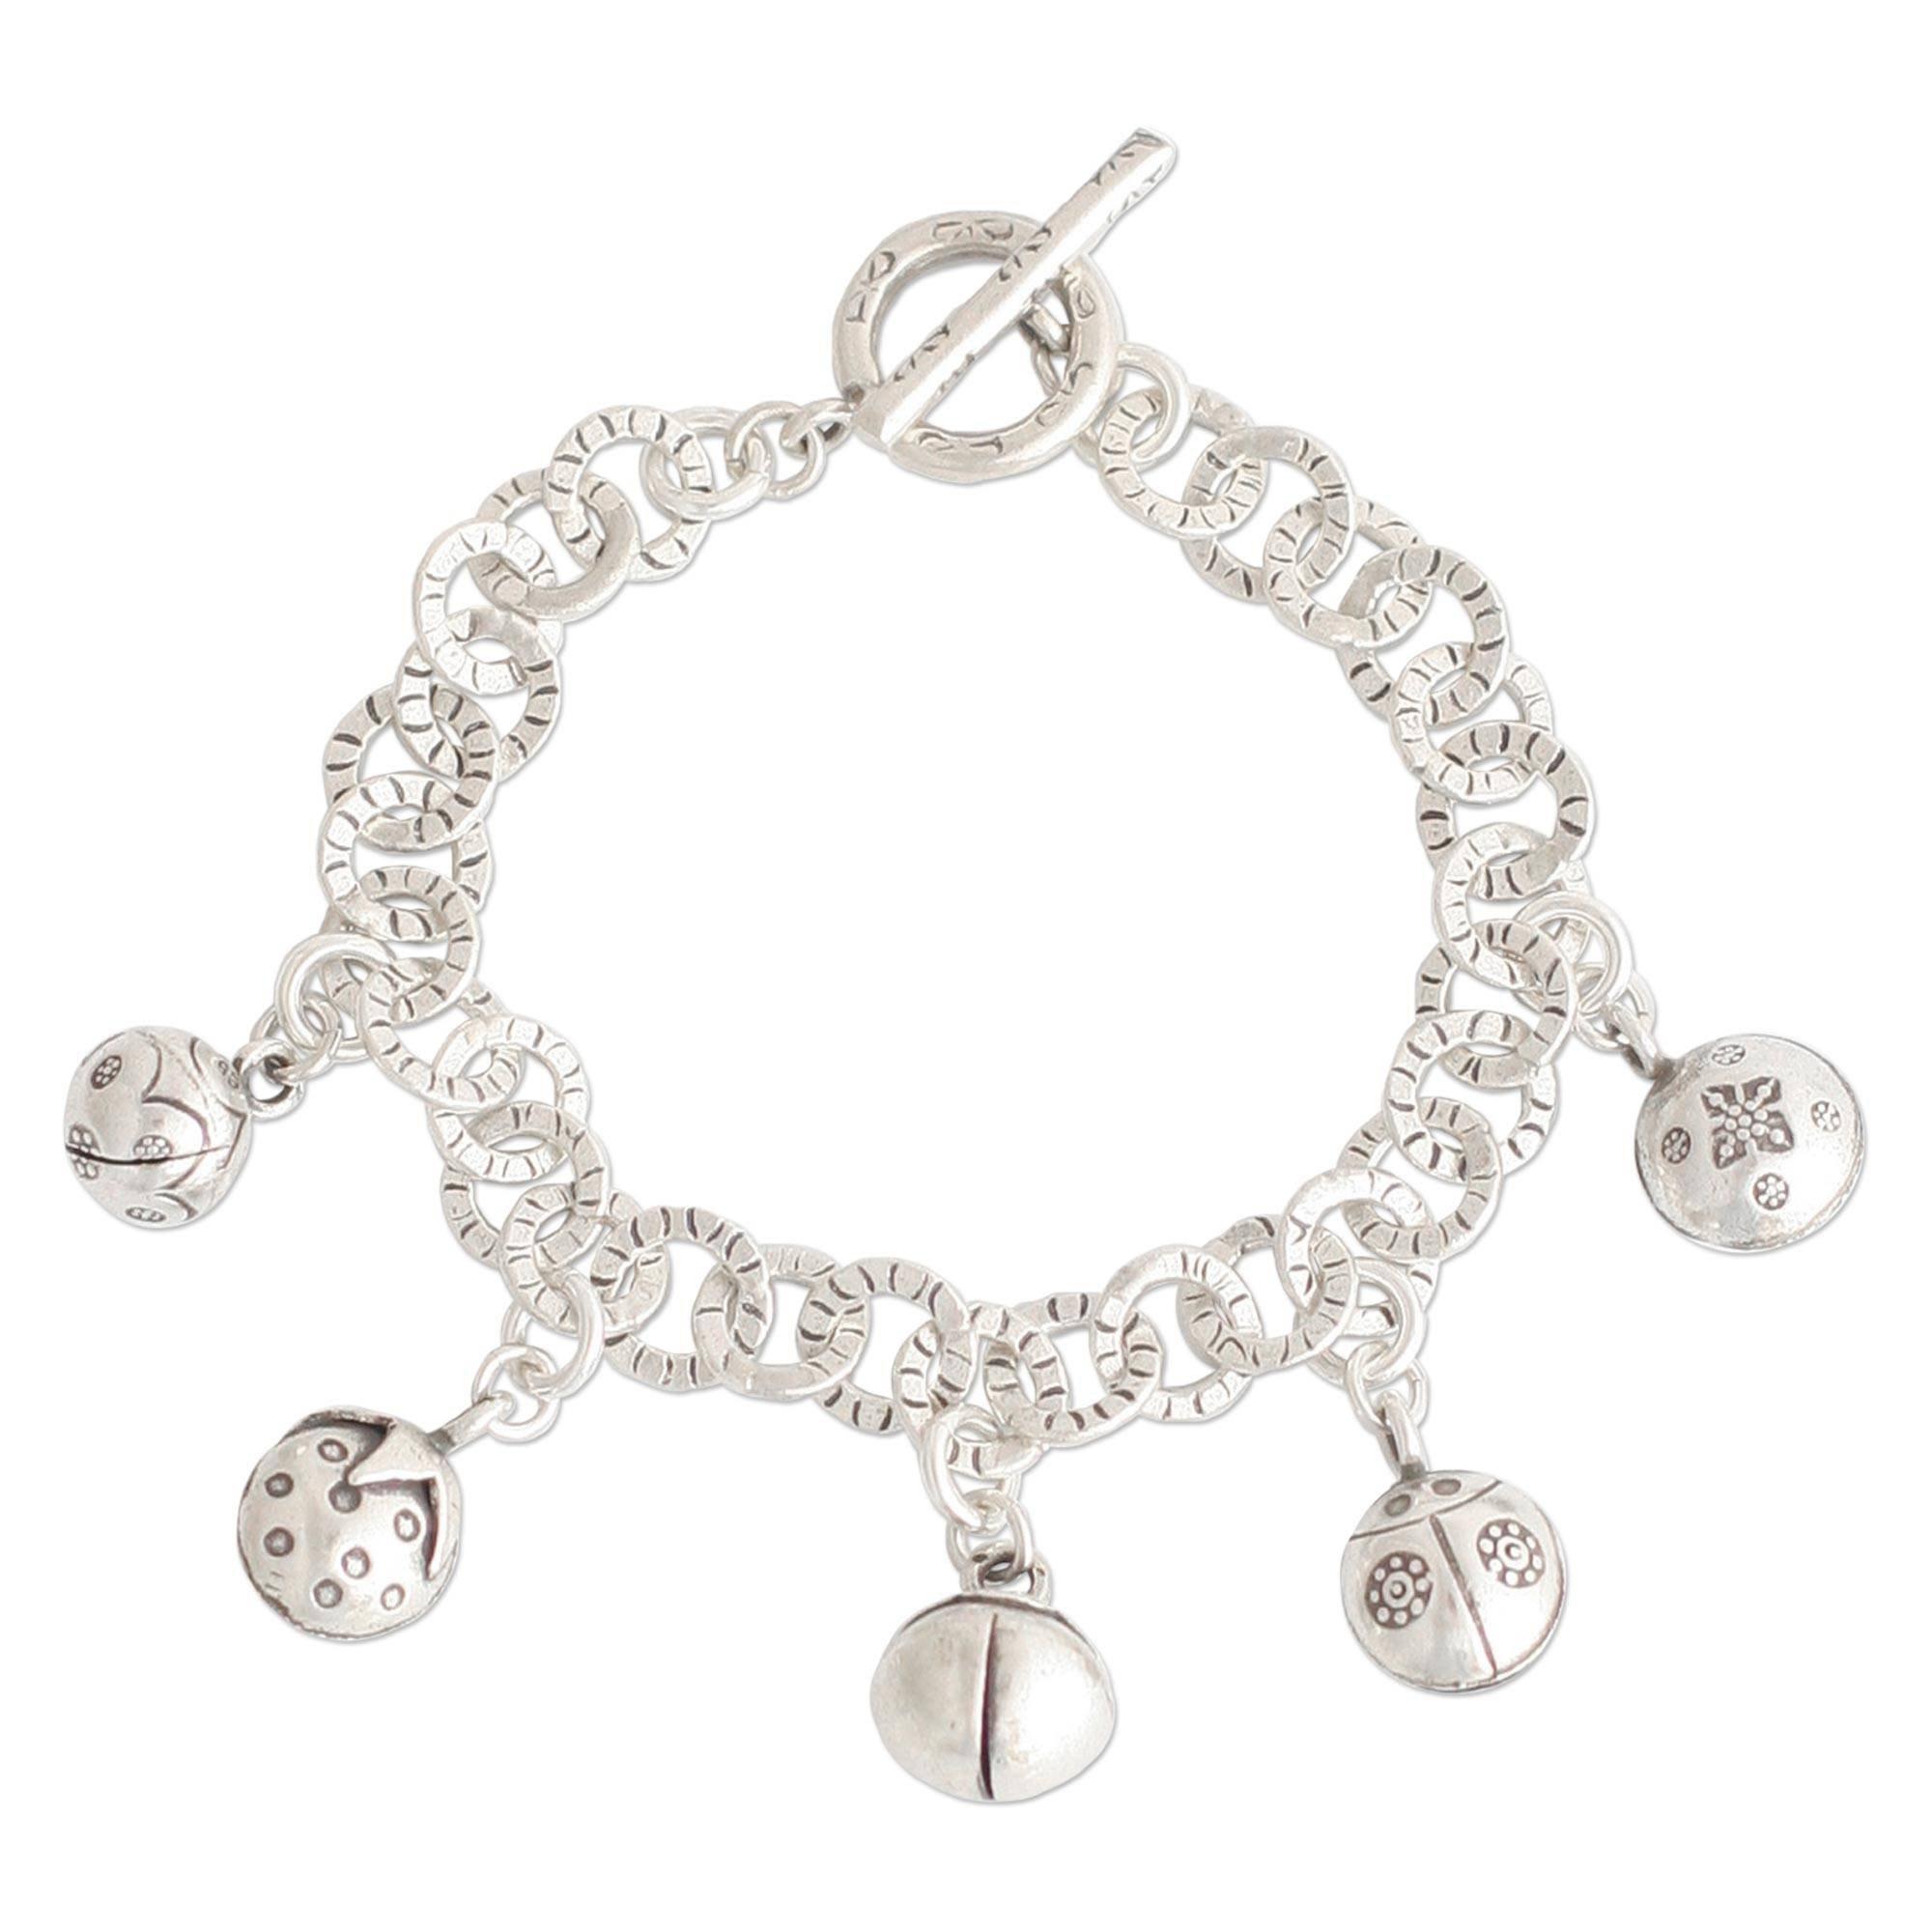 NOVICA .925 Sterling Silver Charm Bracelet 'Ladybug Orchard'